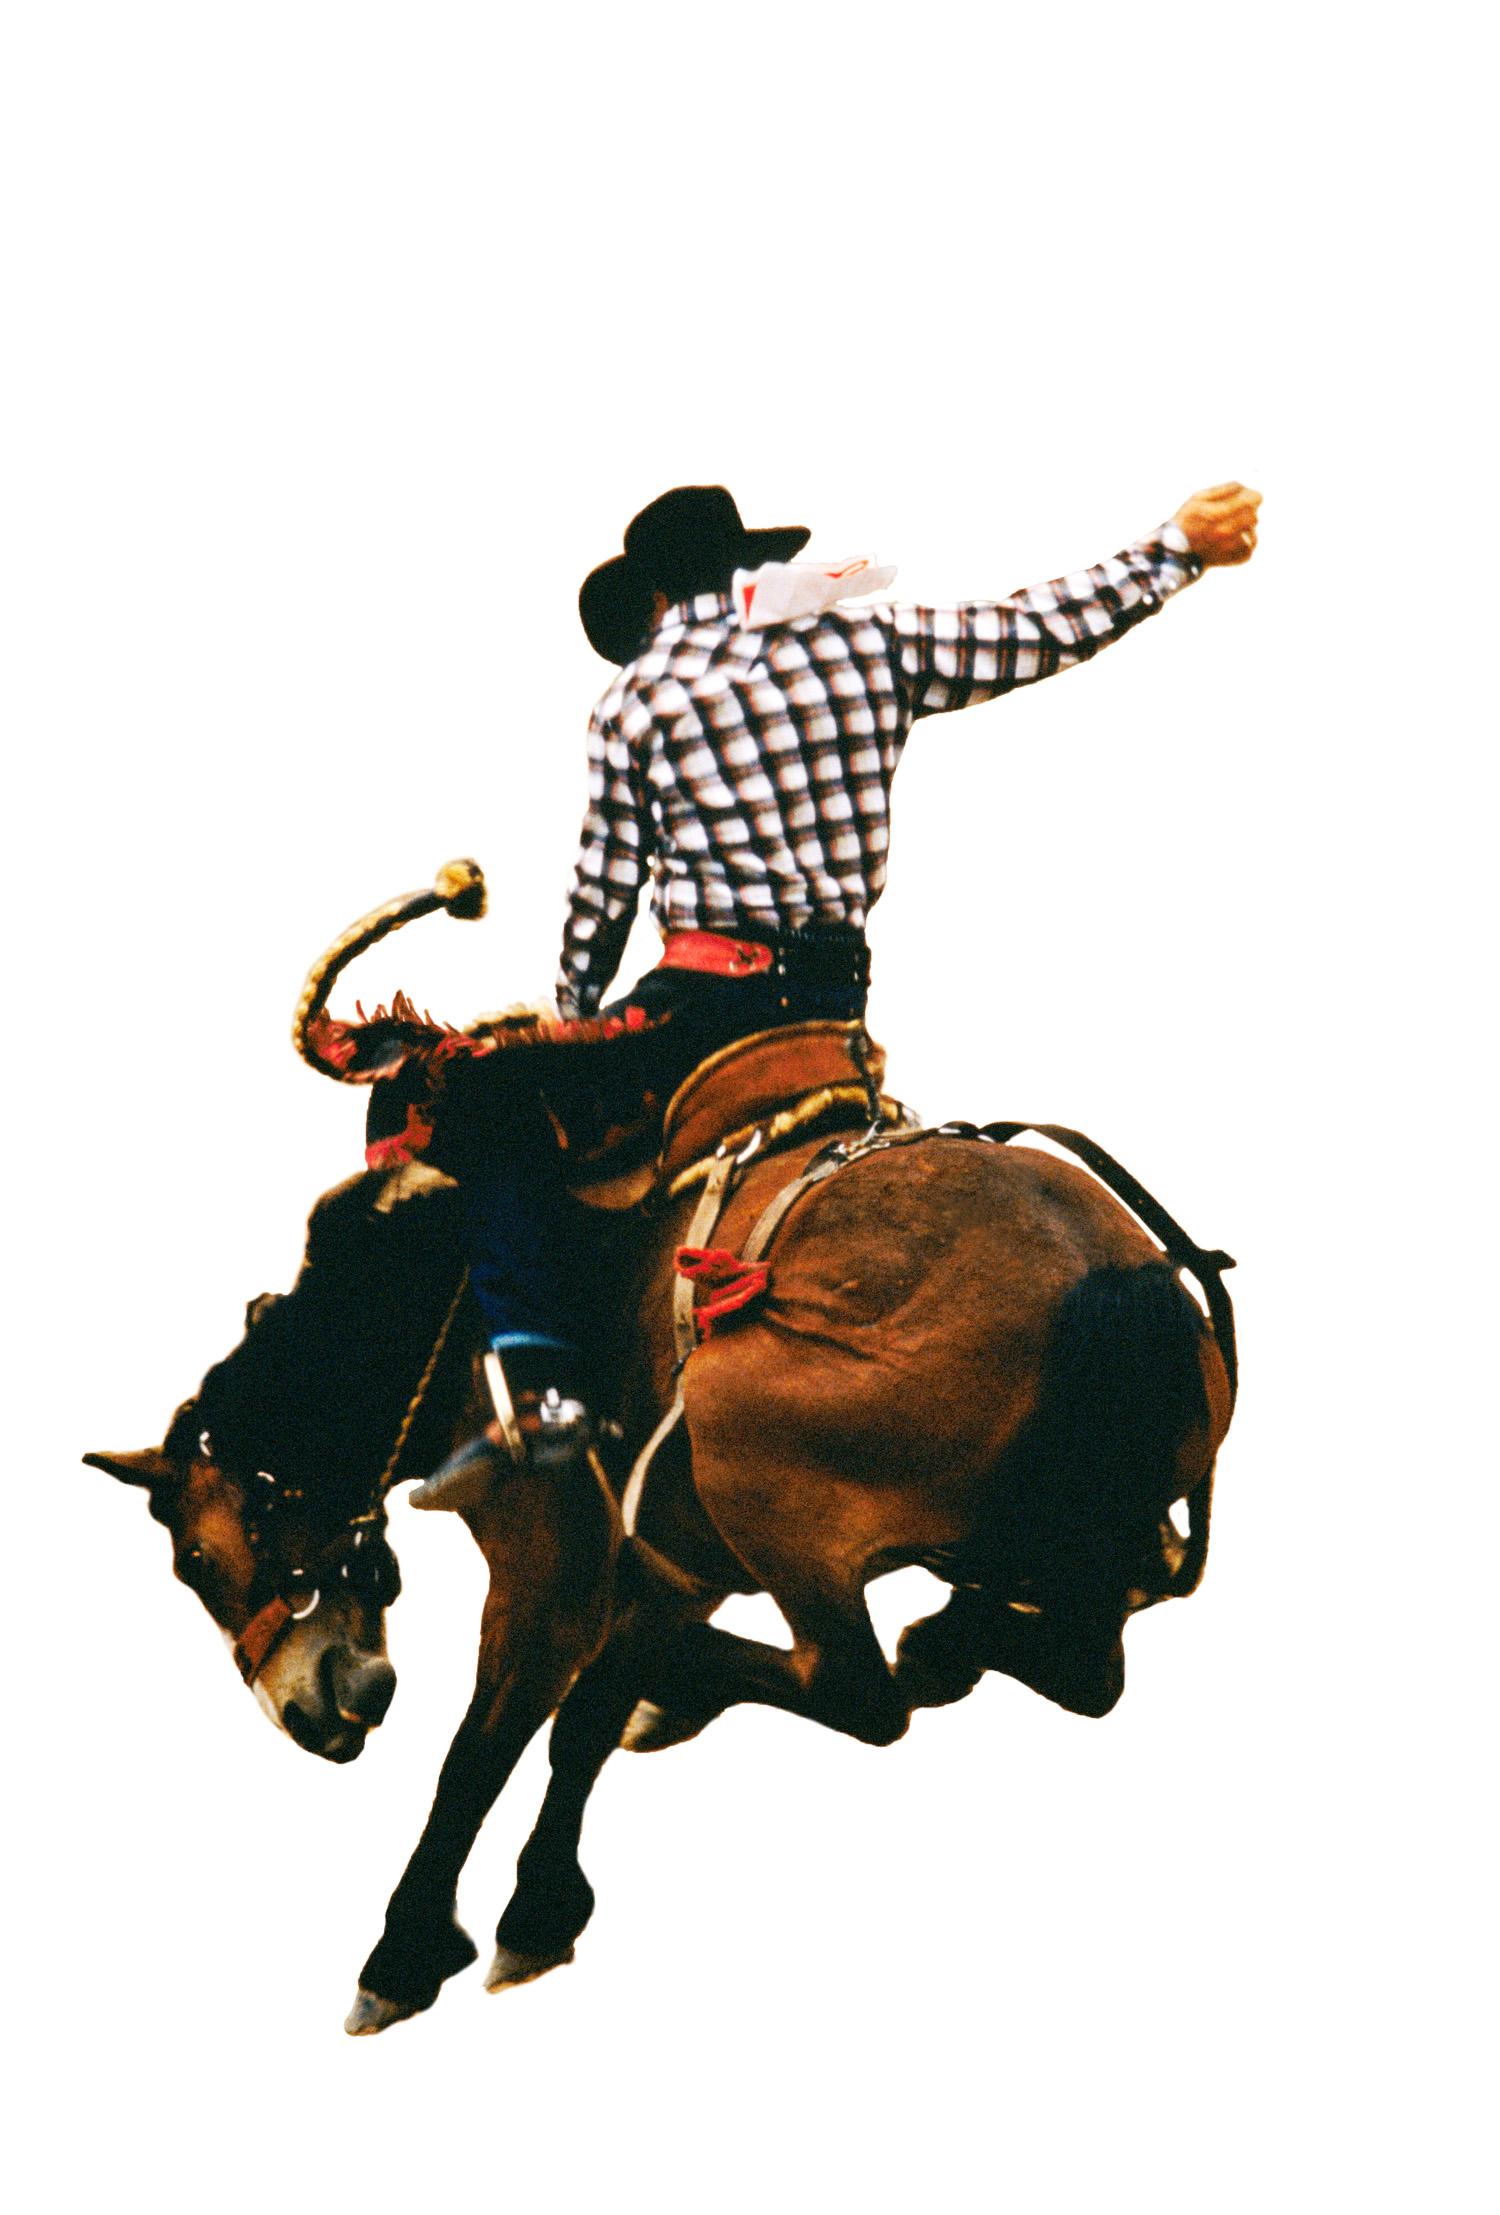 Cheyenne Frontier Days, Cheyenne, WY, Jul 20-29